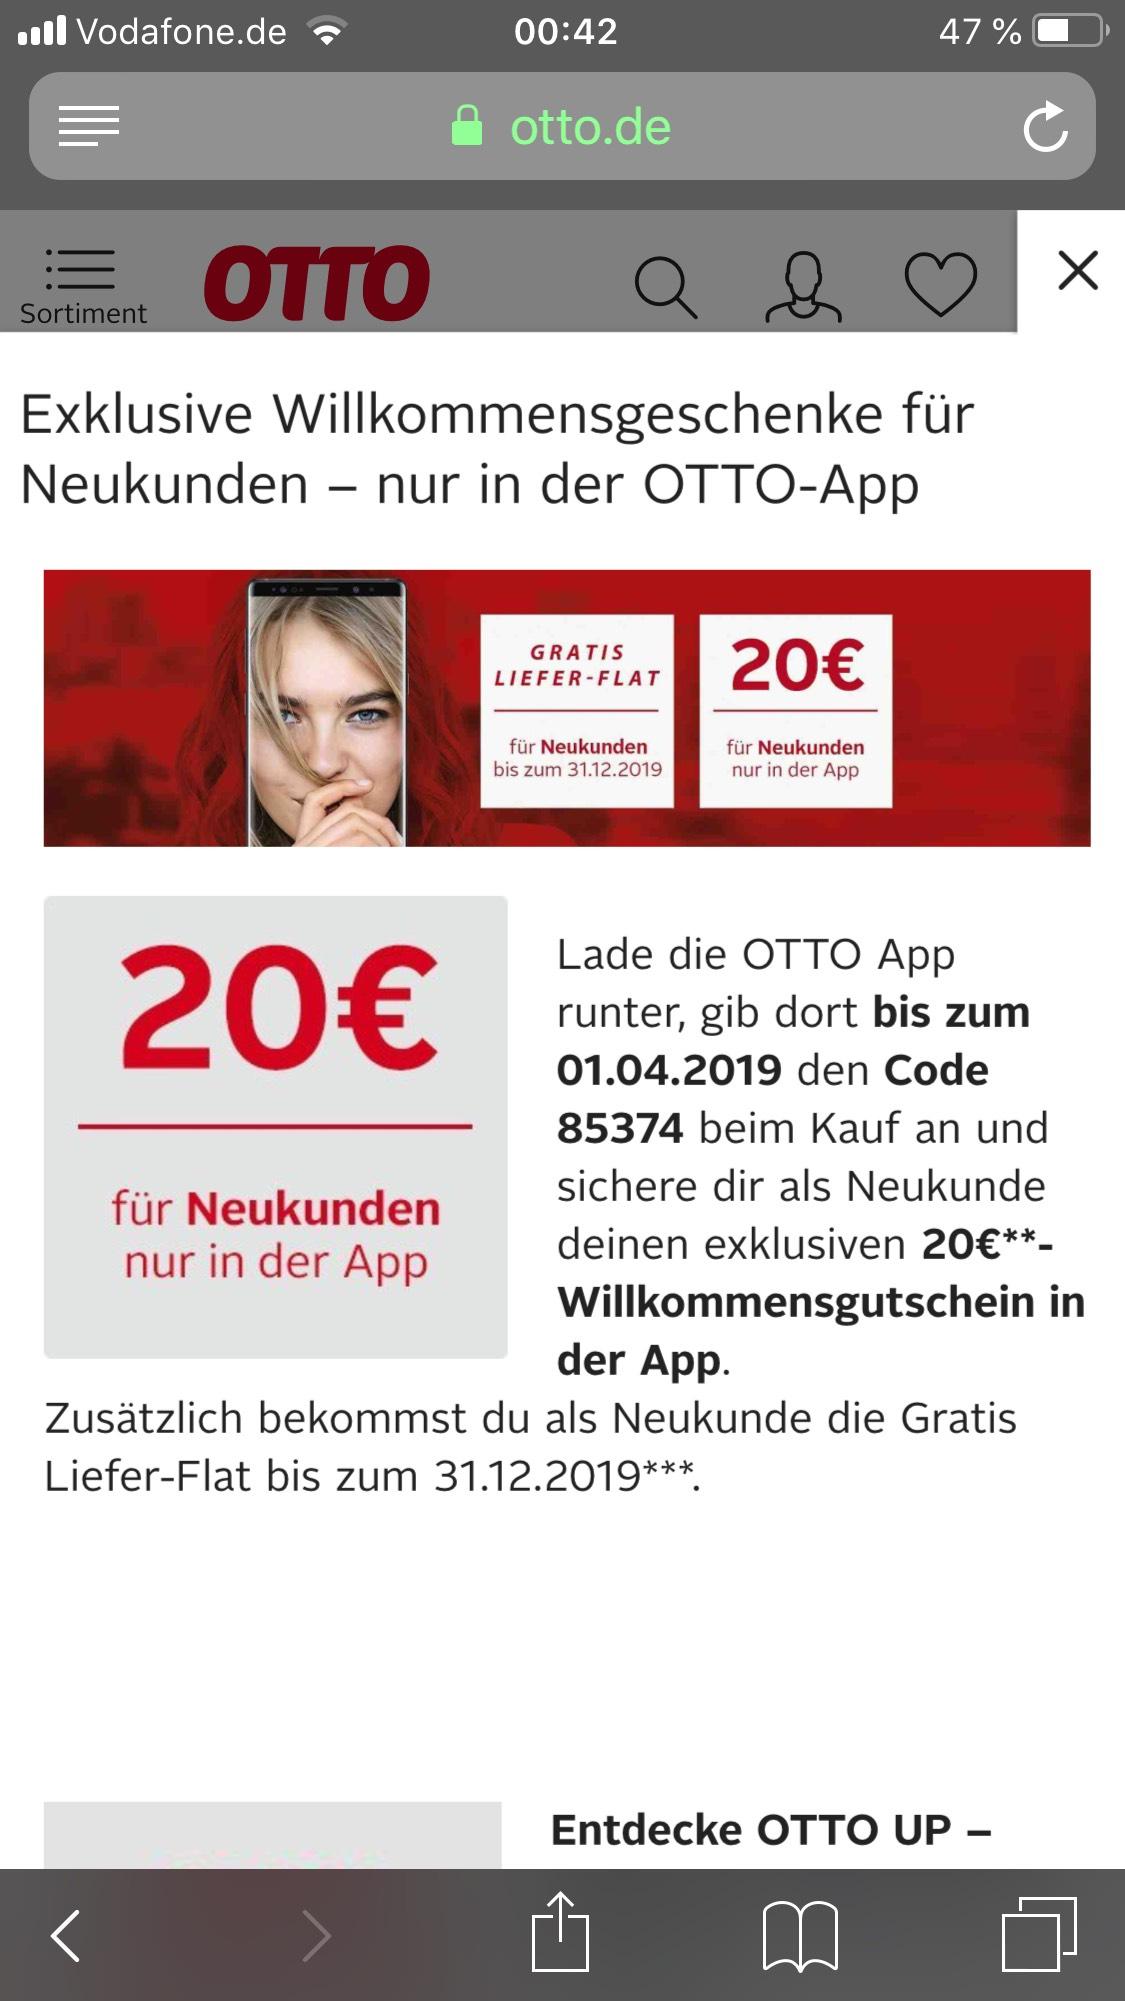 Otto Neukunden Nun 20 50 Mbw Lieferflat App Mydealzde